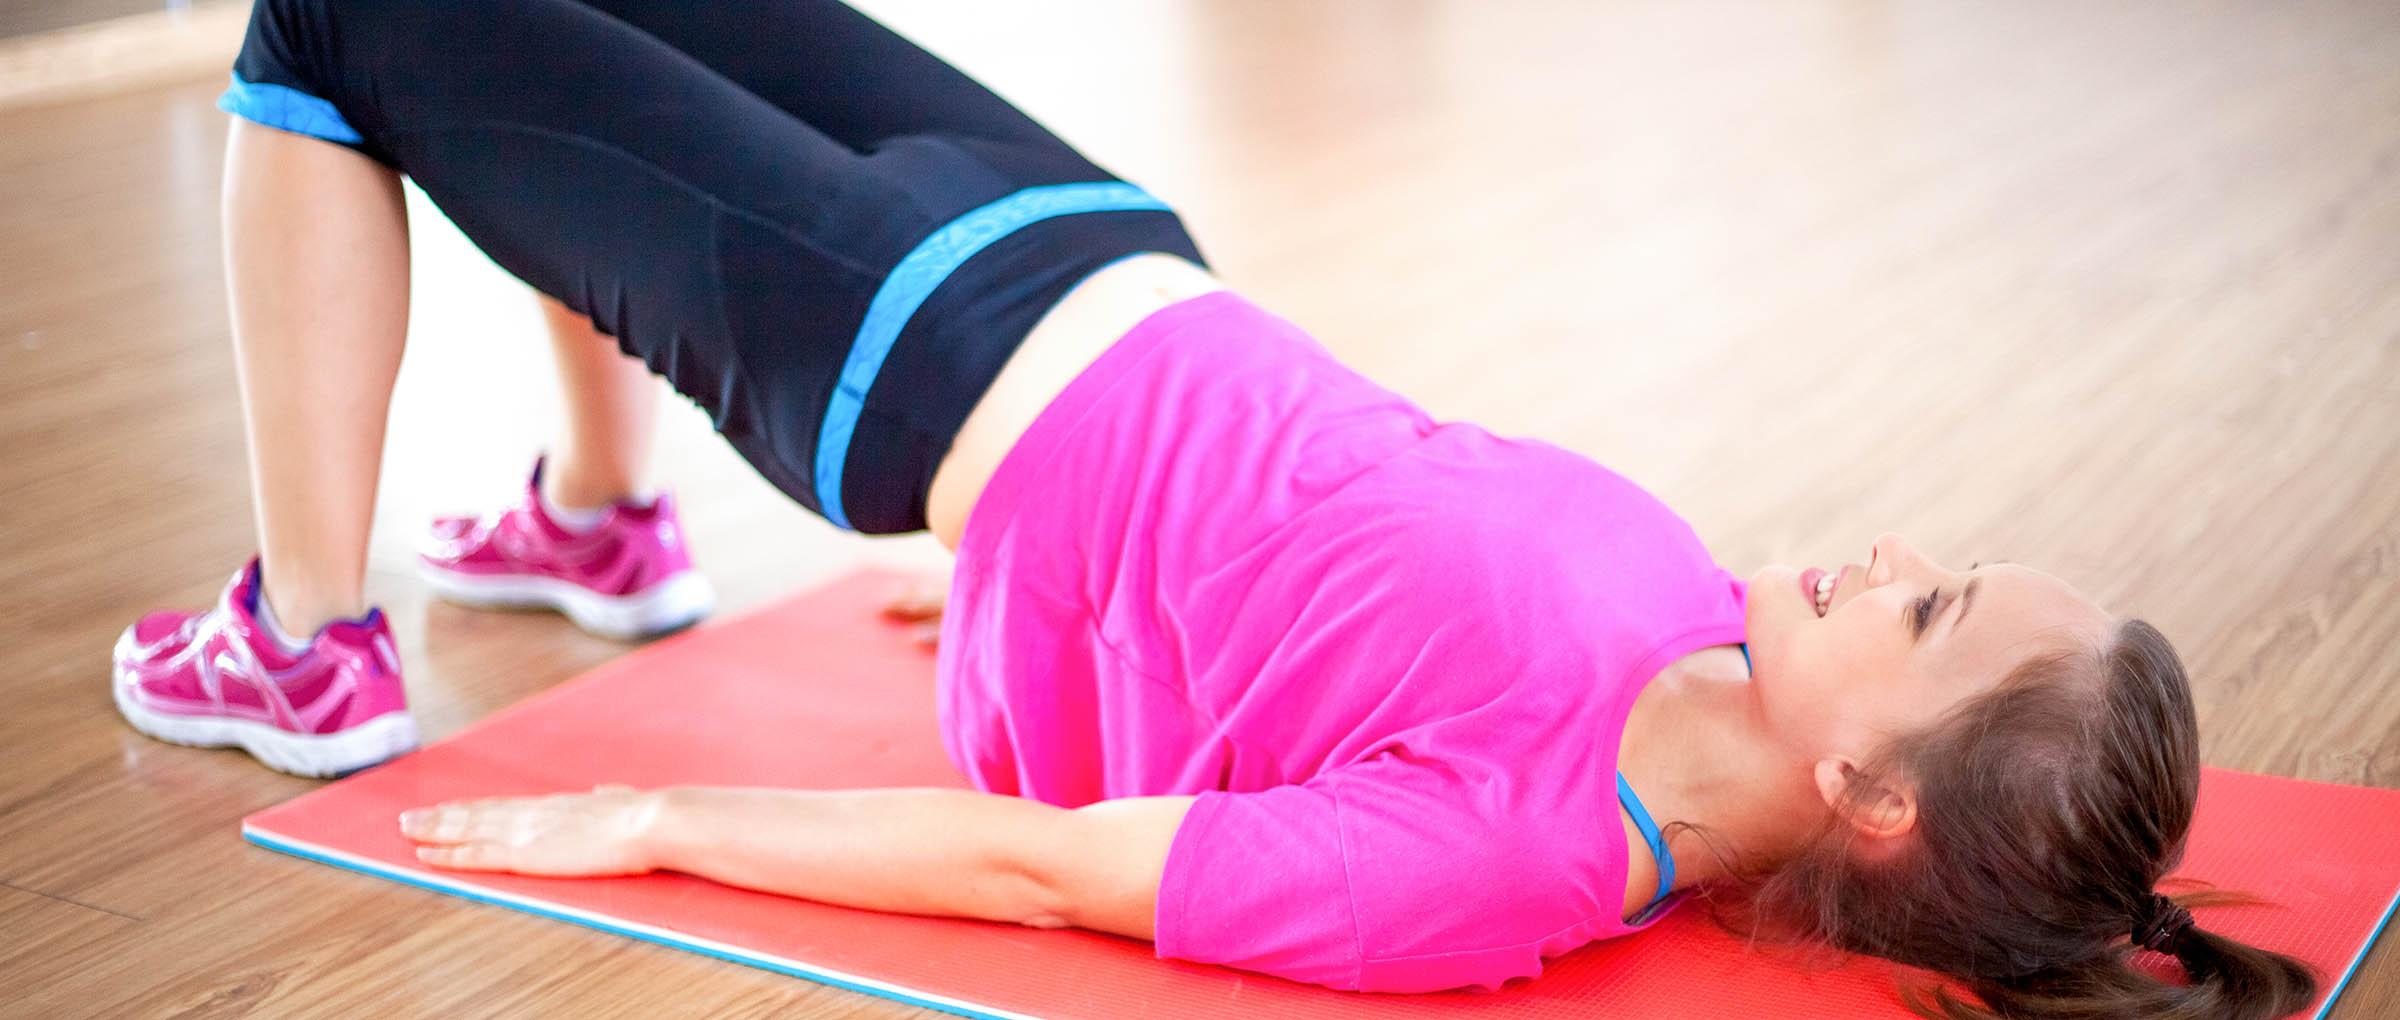 Kegel exercises for vaginismus